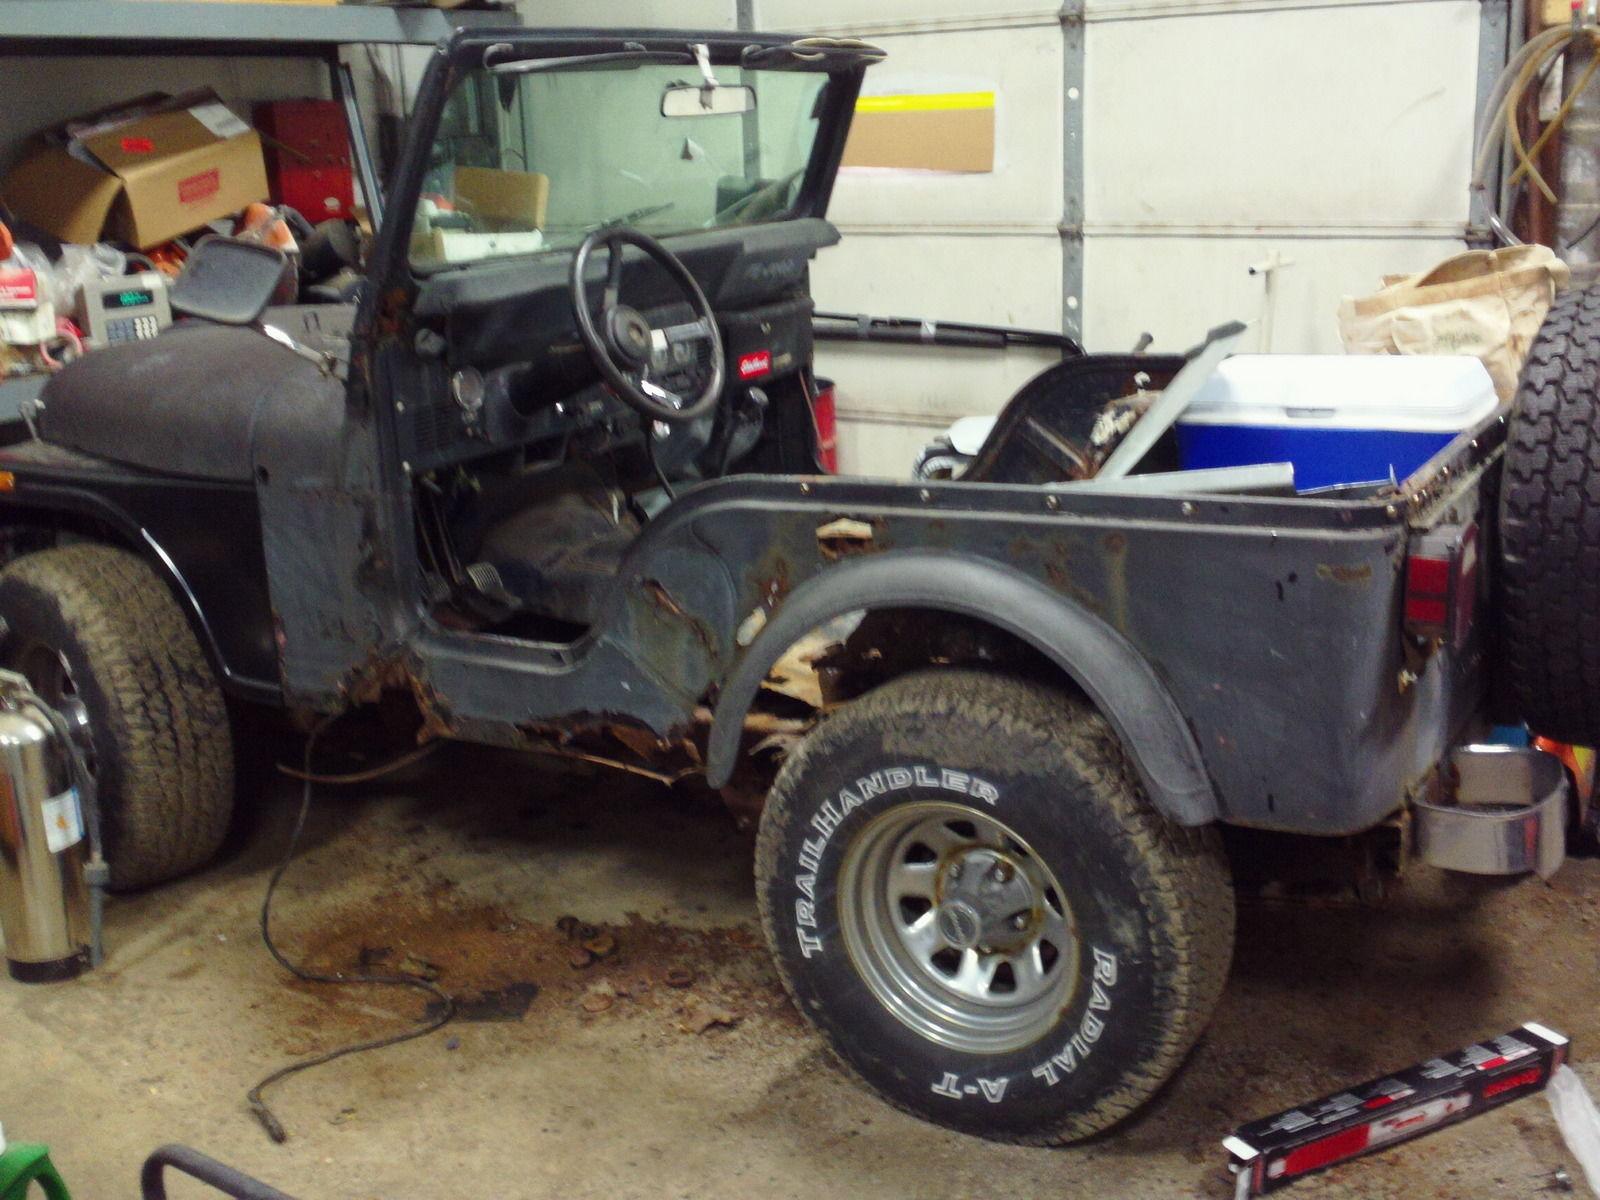 1974 Jeep Cj5 Soft Top - Jeep Cj Chevy X Soft Top - 1974 Jeep Cj5 Soft Top